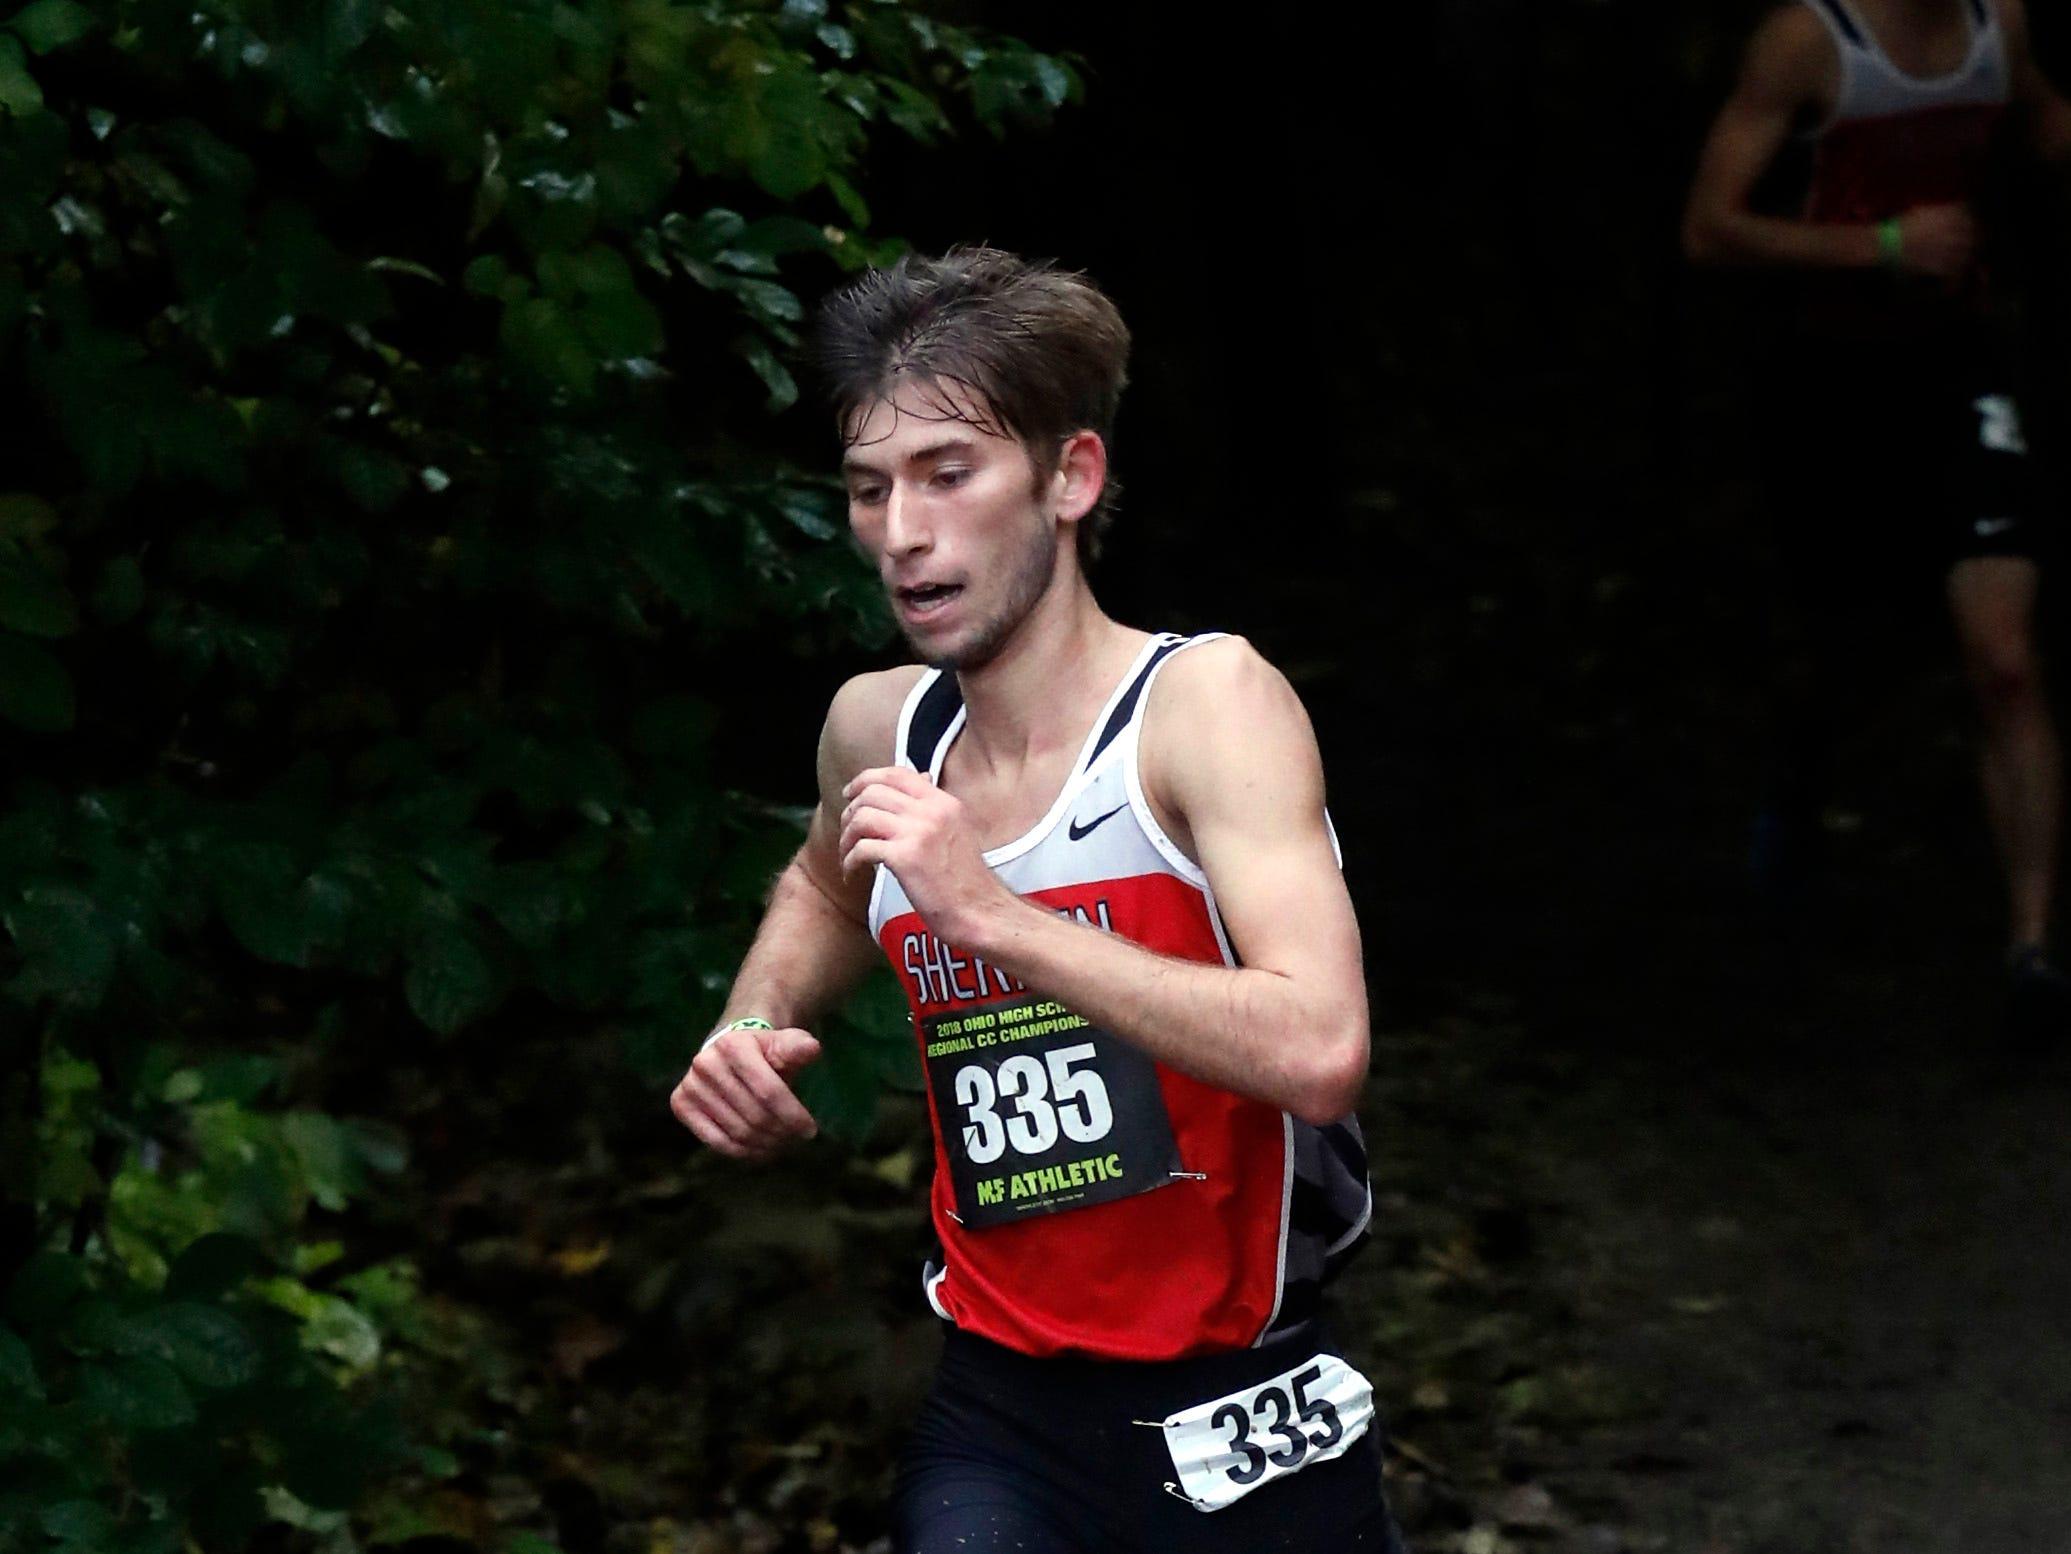 Sheridan's Mitchell Wells runs in the Regional Cross Country meet Saturday, Oct. 27, 2018, at Pickerington North High School in Pickerington.